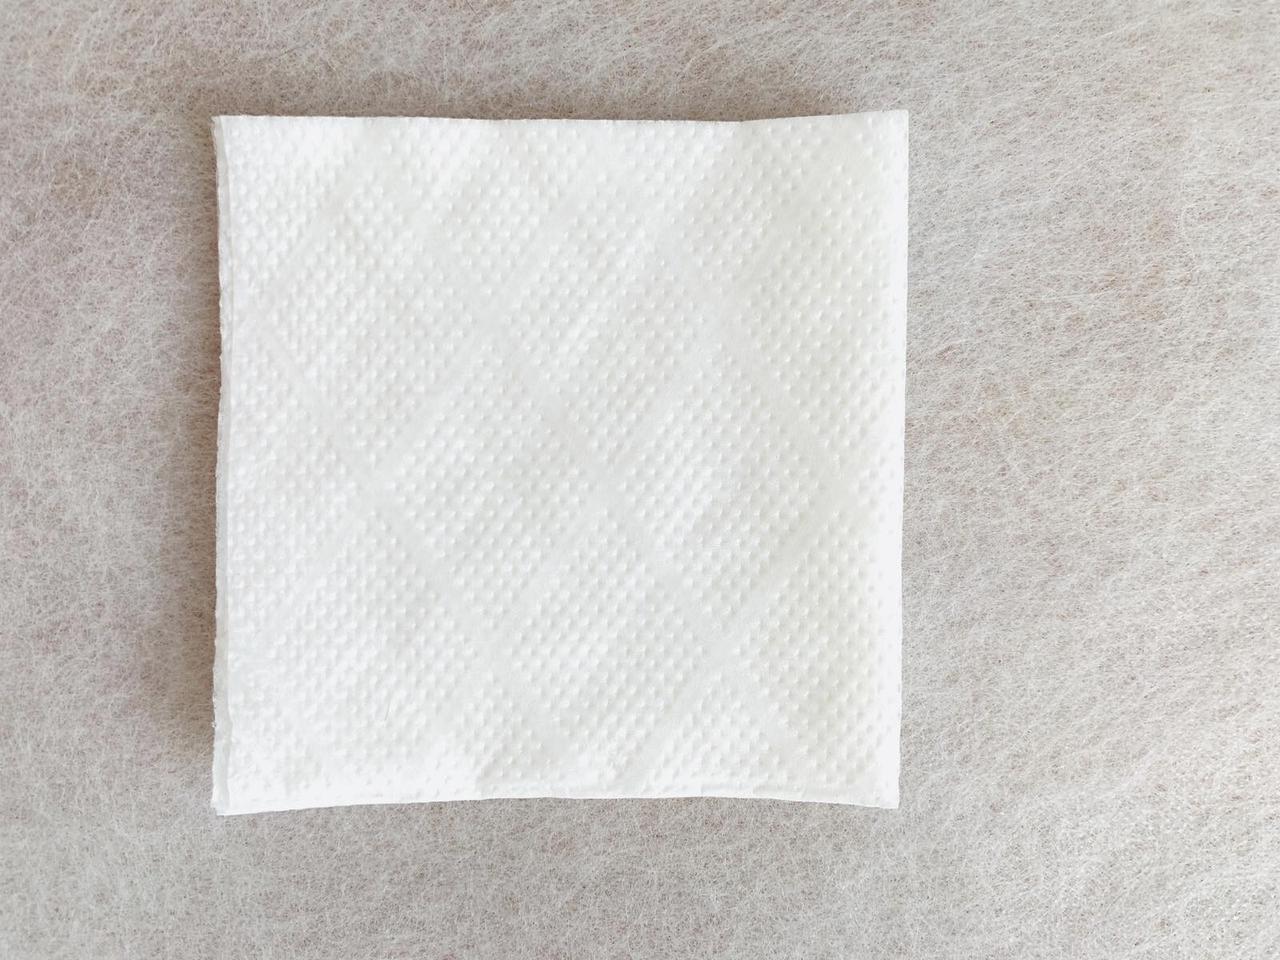 Салфетка бумажная барная Чистый плюс 1000 штук